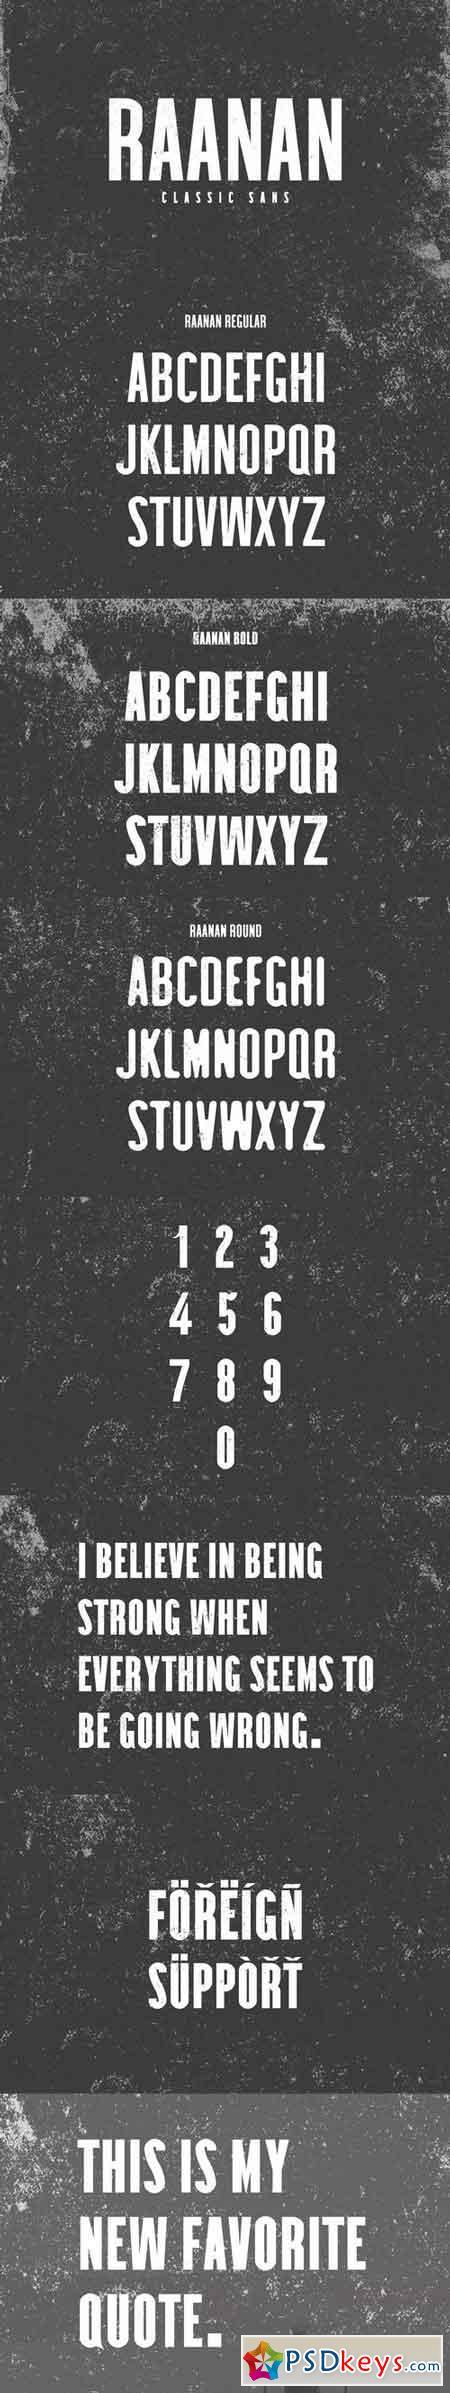 Raanan Classic Sans Serif Font Family 3188463